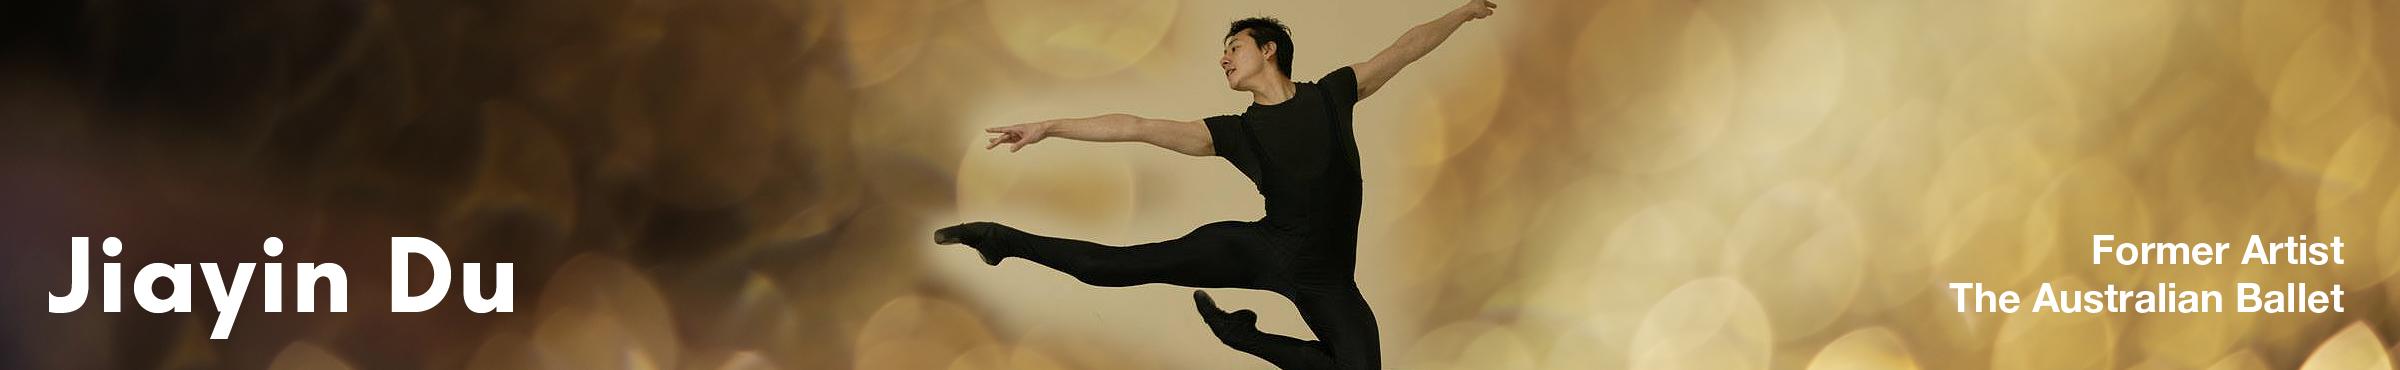 Jiayin Du, Patron, Melbourne Academy of the Arts